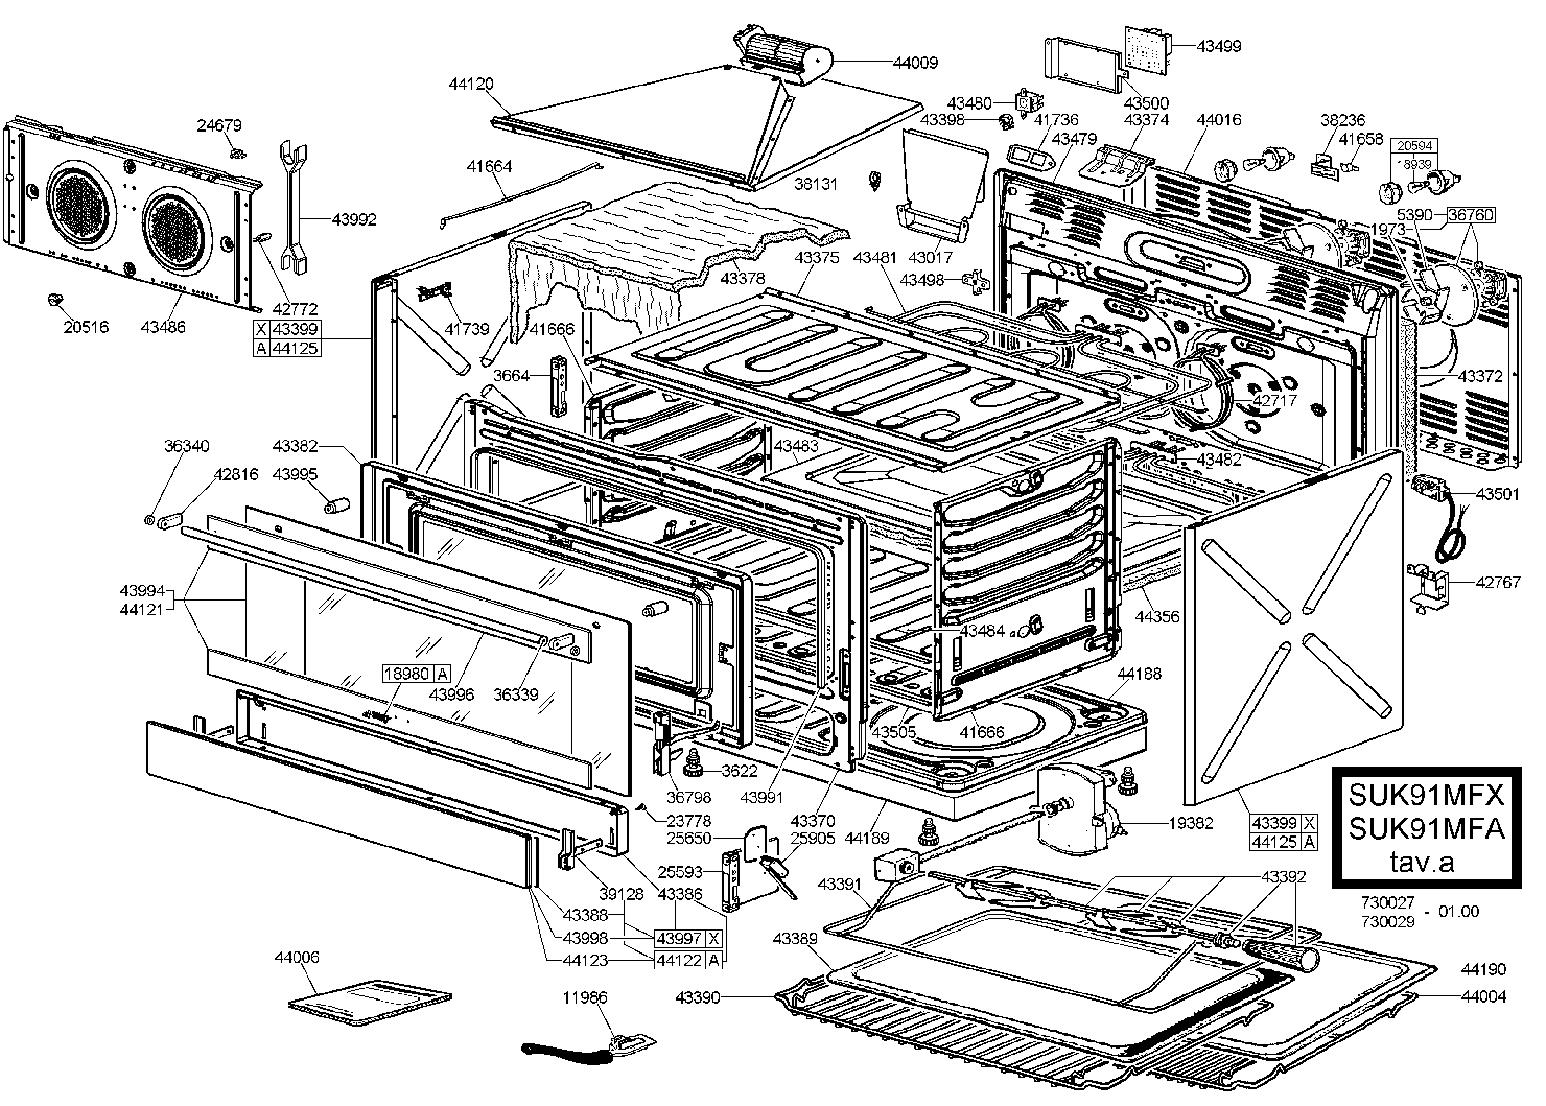 smeg suk91mfx cooker \u0026 oven parts partmaster Key Wiring Diagram